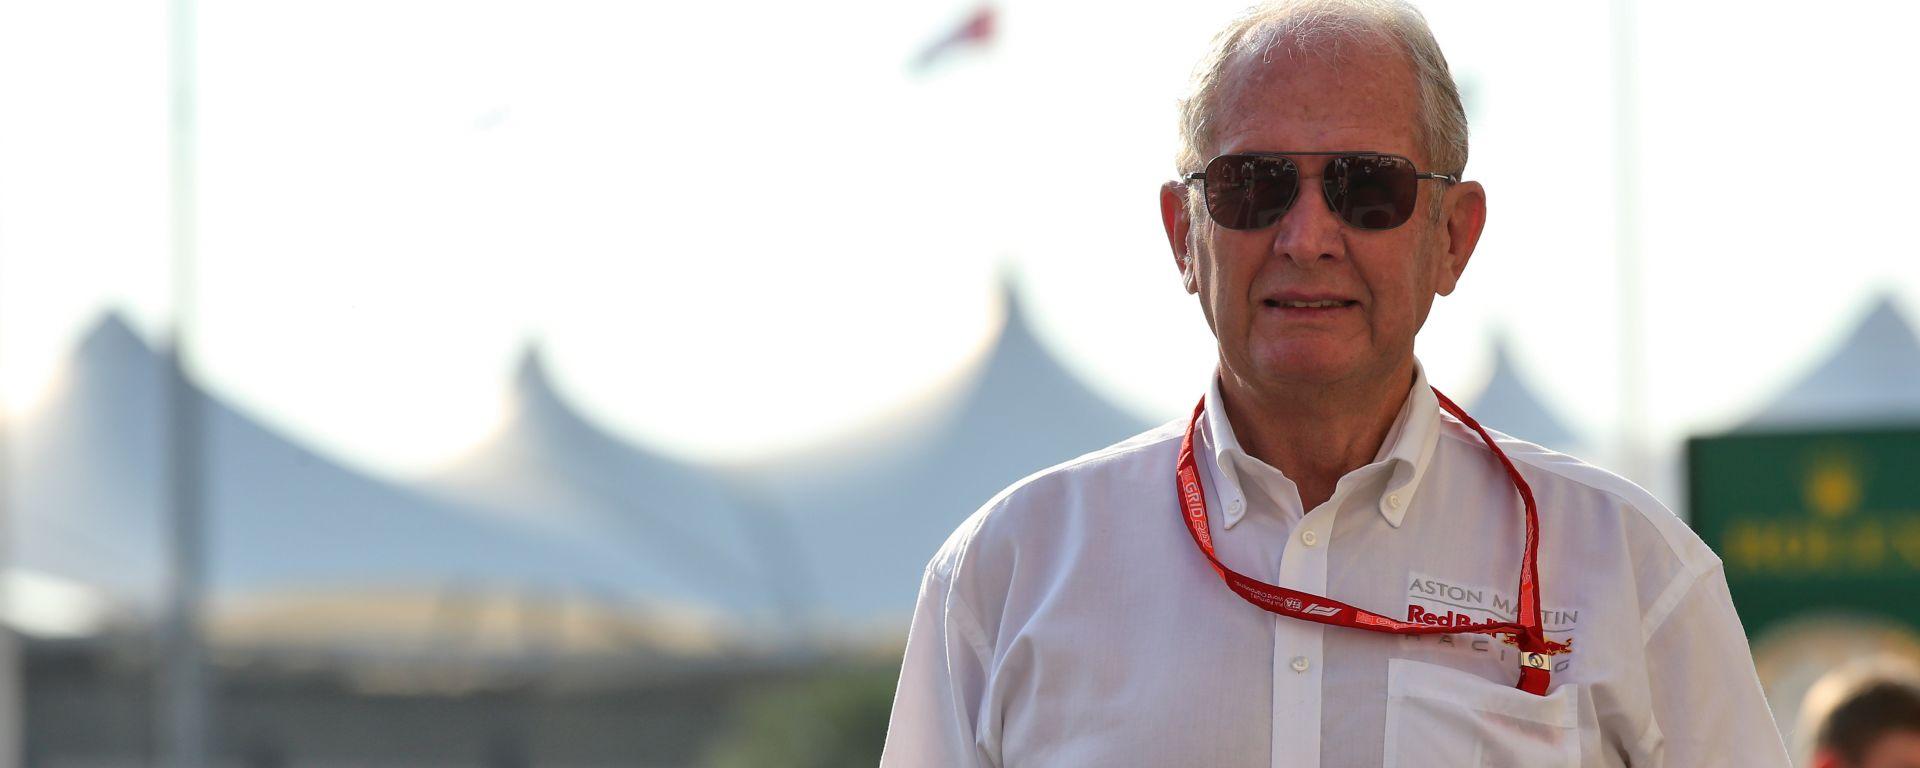 F1 2019: Helmut Marko (Red Bull)